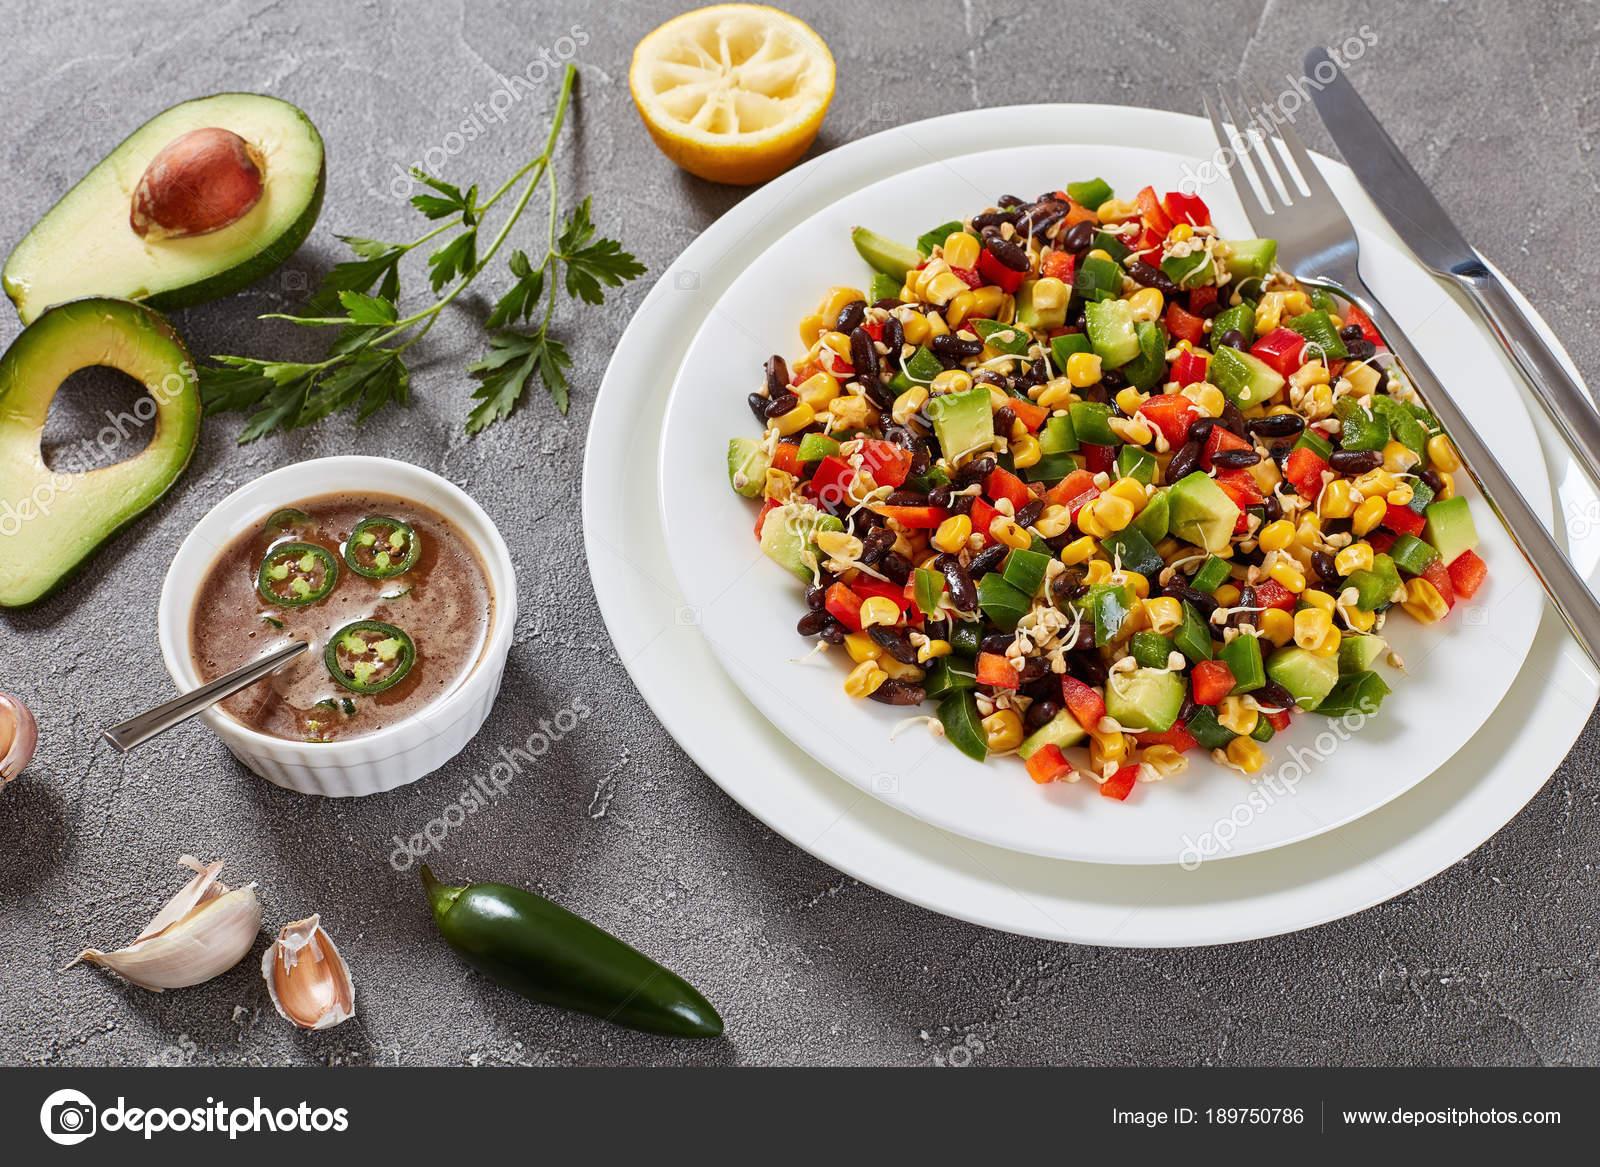 mexikanische wenig kalorien salat auf teller stockfoto myviewpoint 189750786. Black Bedroom Furniture Sets. Home Design Ideas